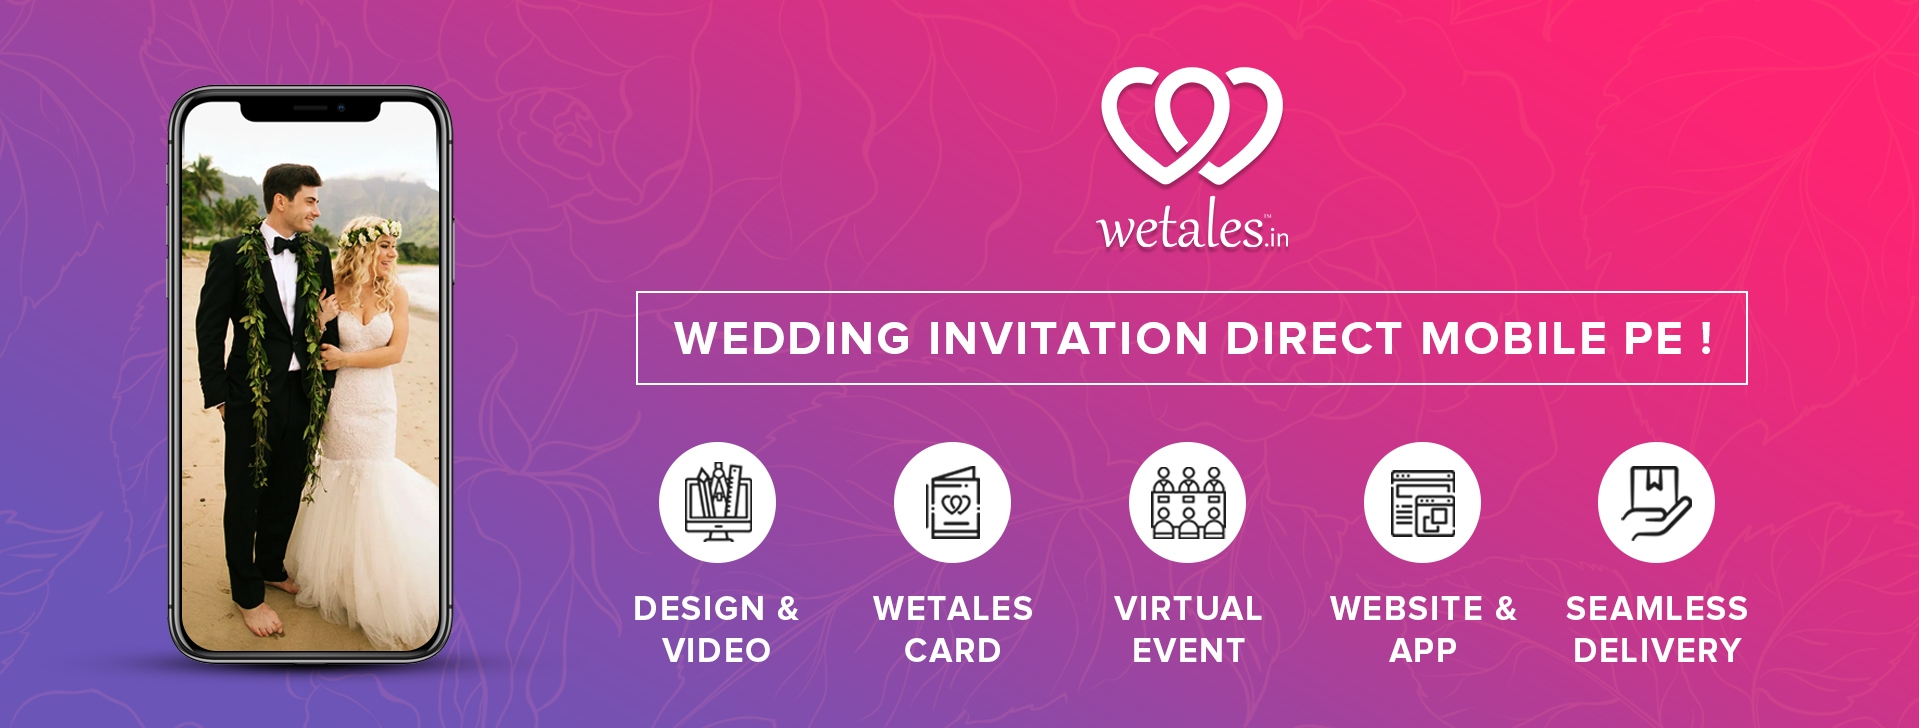 WeTales - Digital Event Partner (@wetales) Cover Image